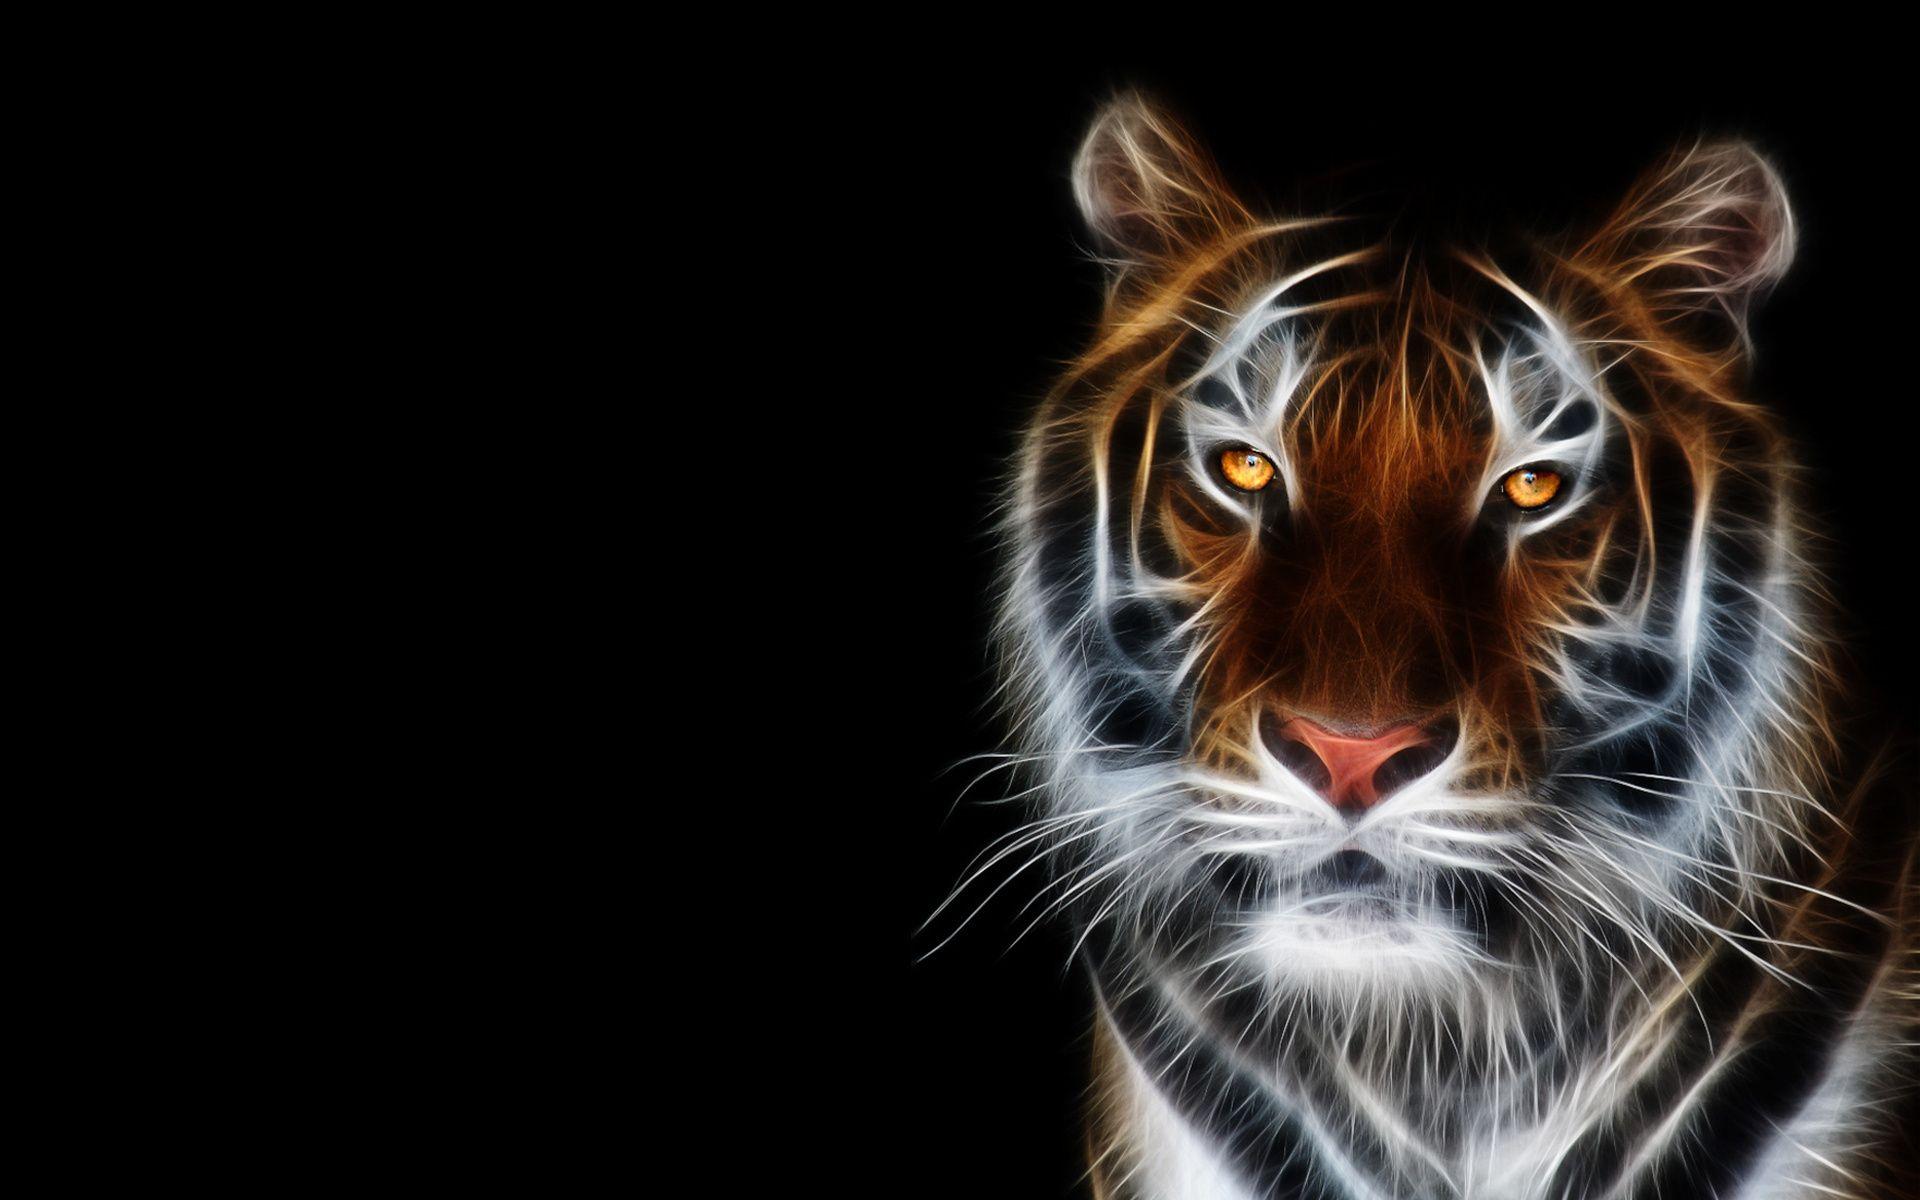 3D Tiger 3D Animals Pinterest 3d, Tigers and Animal